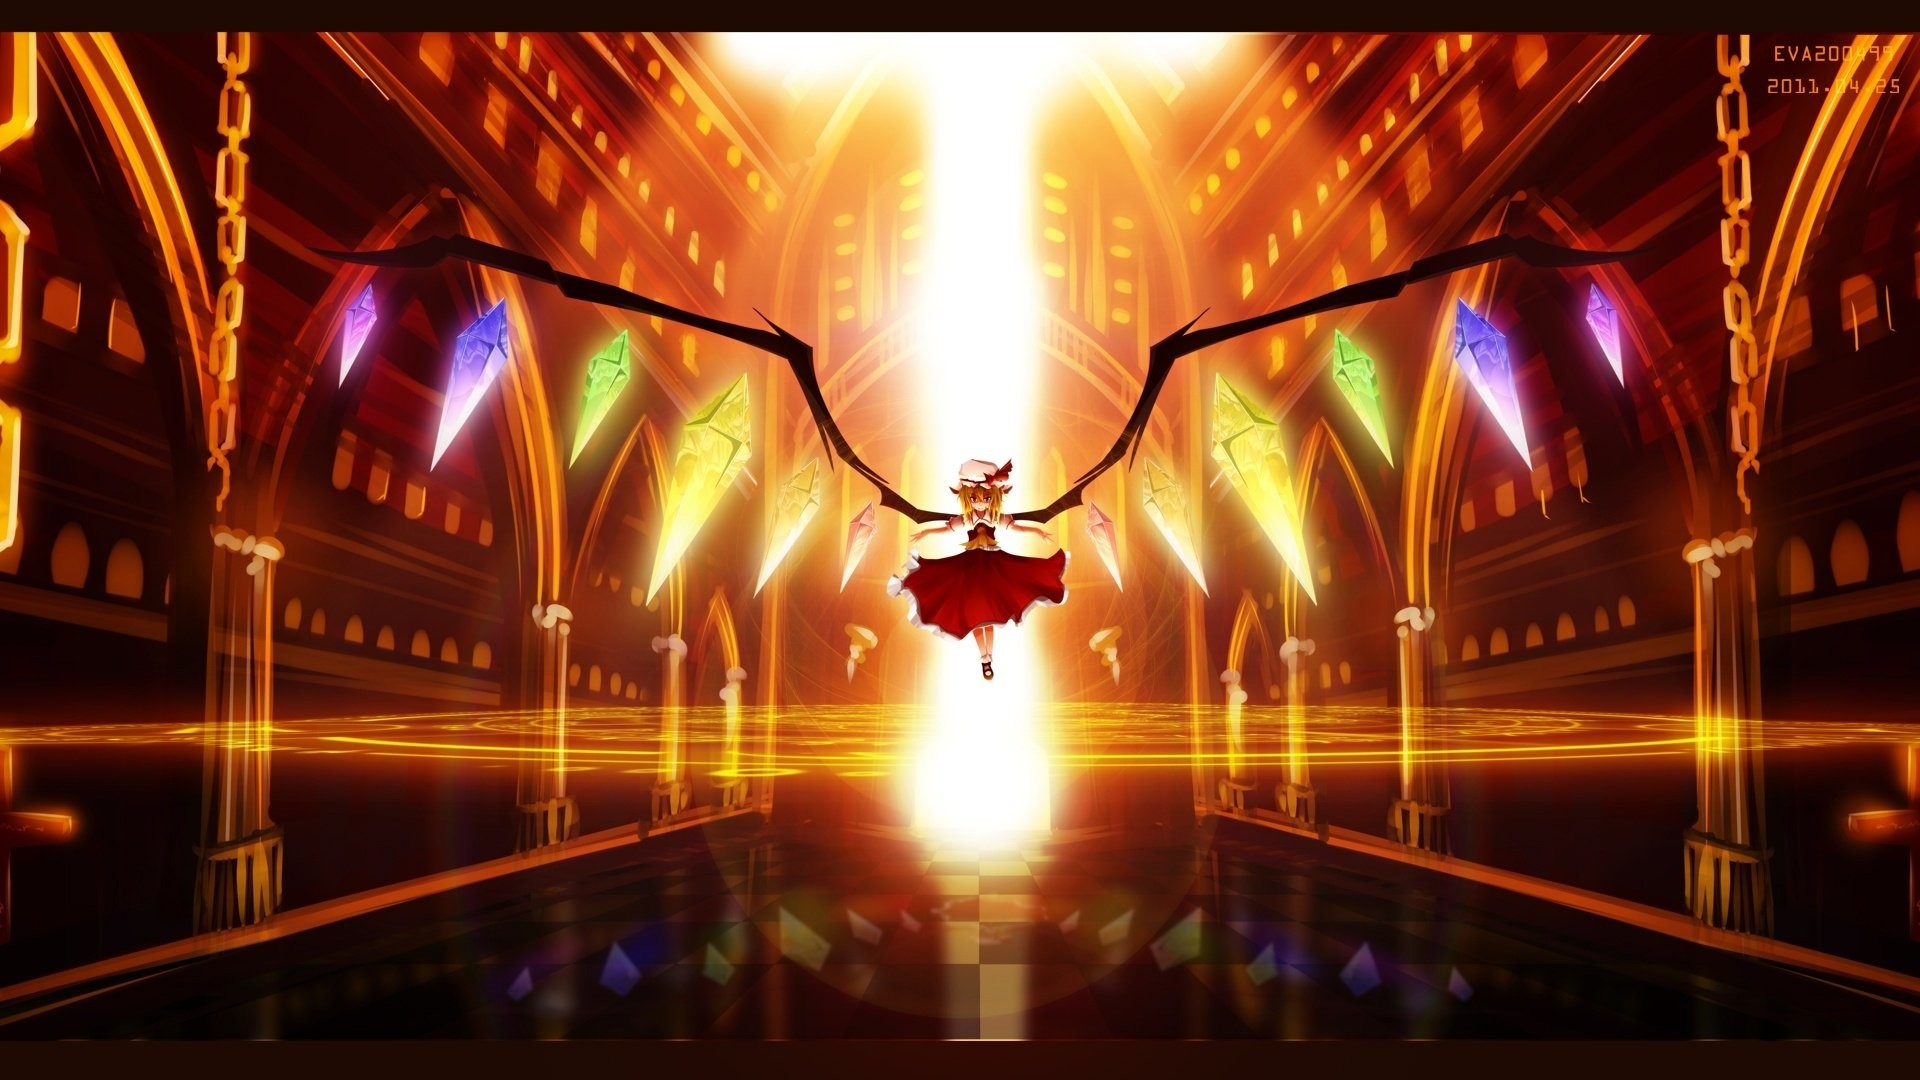 Anime – Touhou Flandre Scarlet Wallpaper